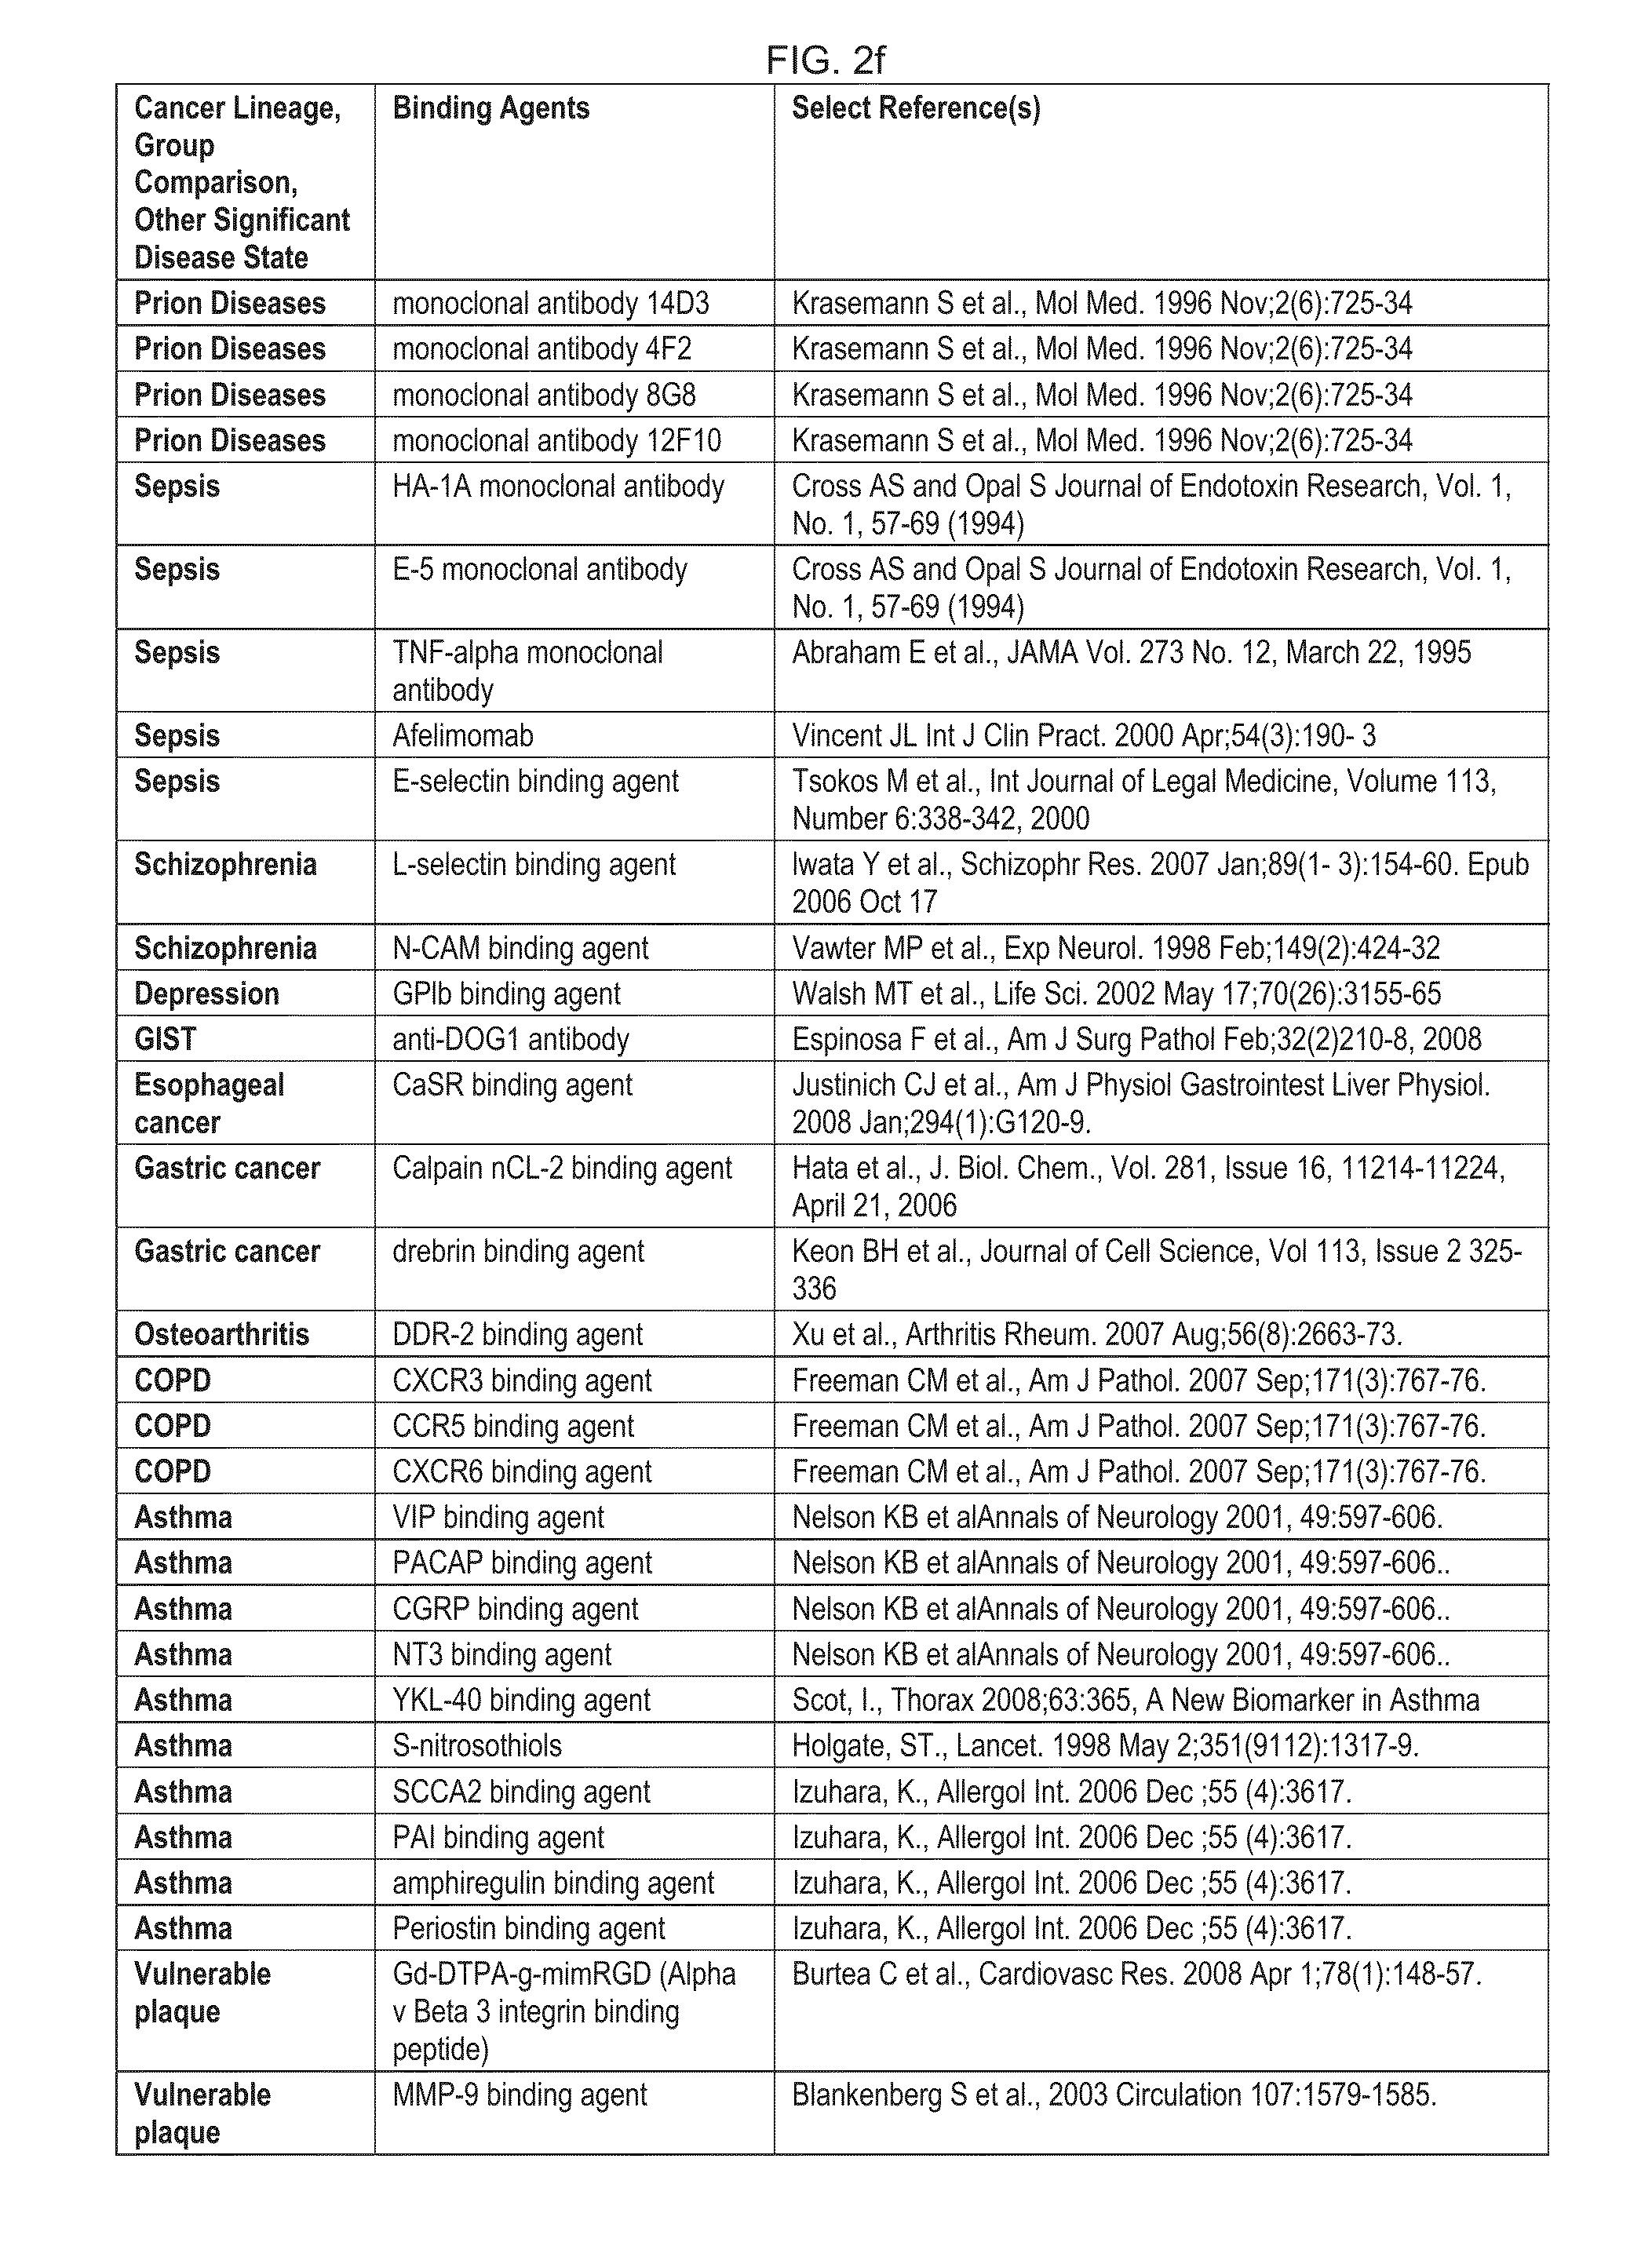 Patent US 9,128,101 B2